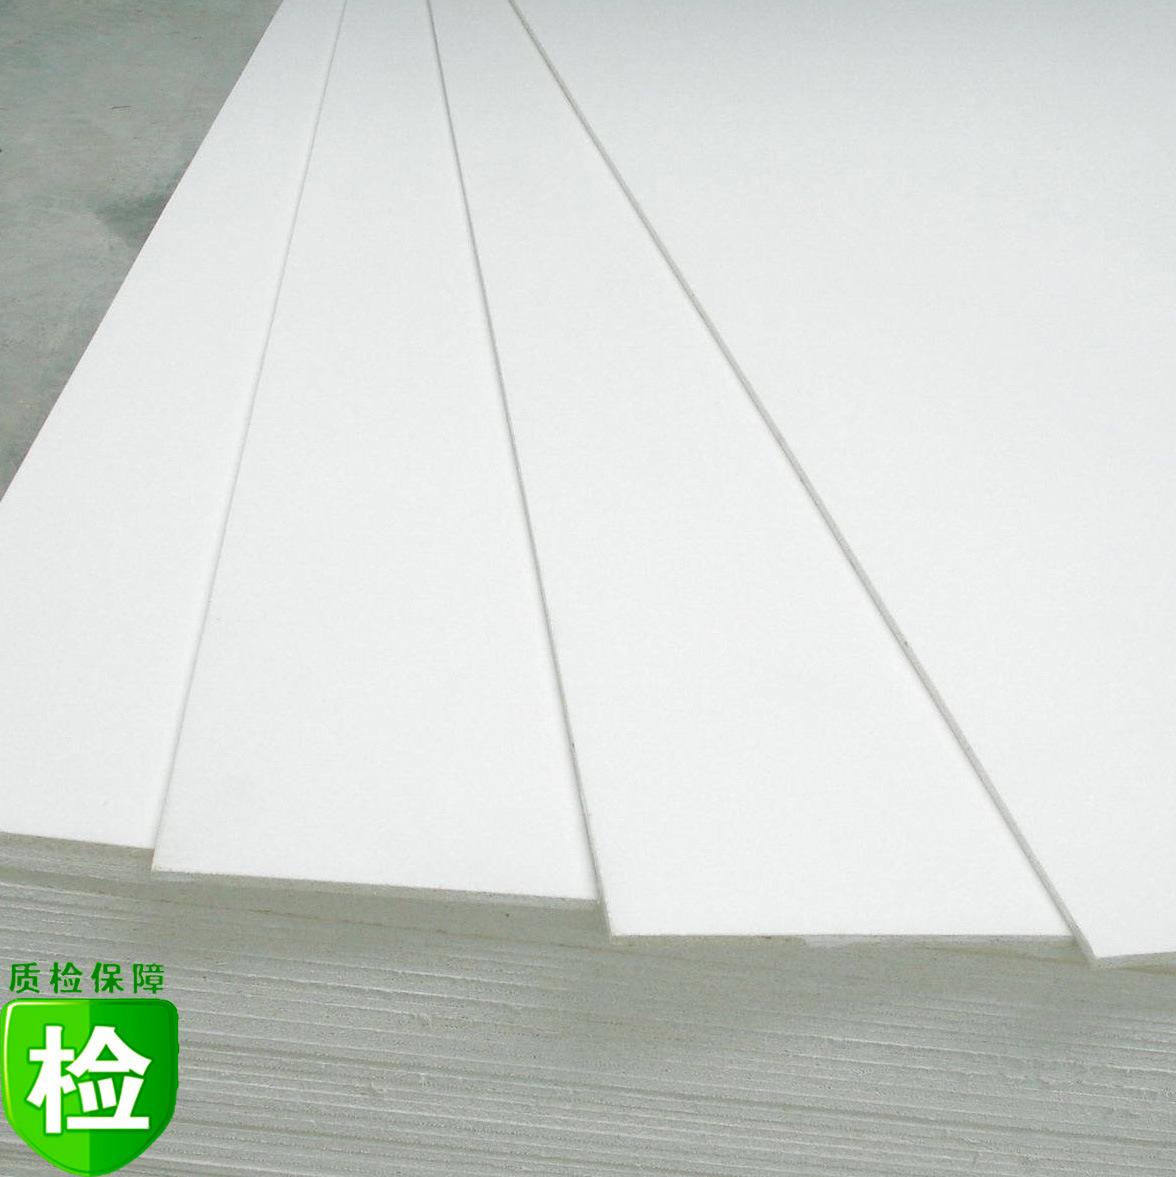 5mm贴面氧化玻镁平板 北京珍珠岩防火板 江苏PVC贴面防火板厂家